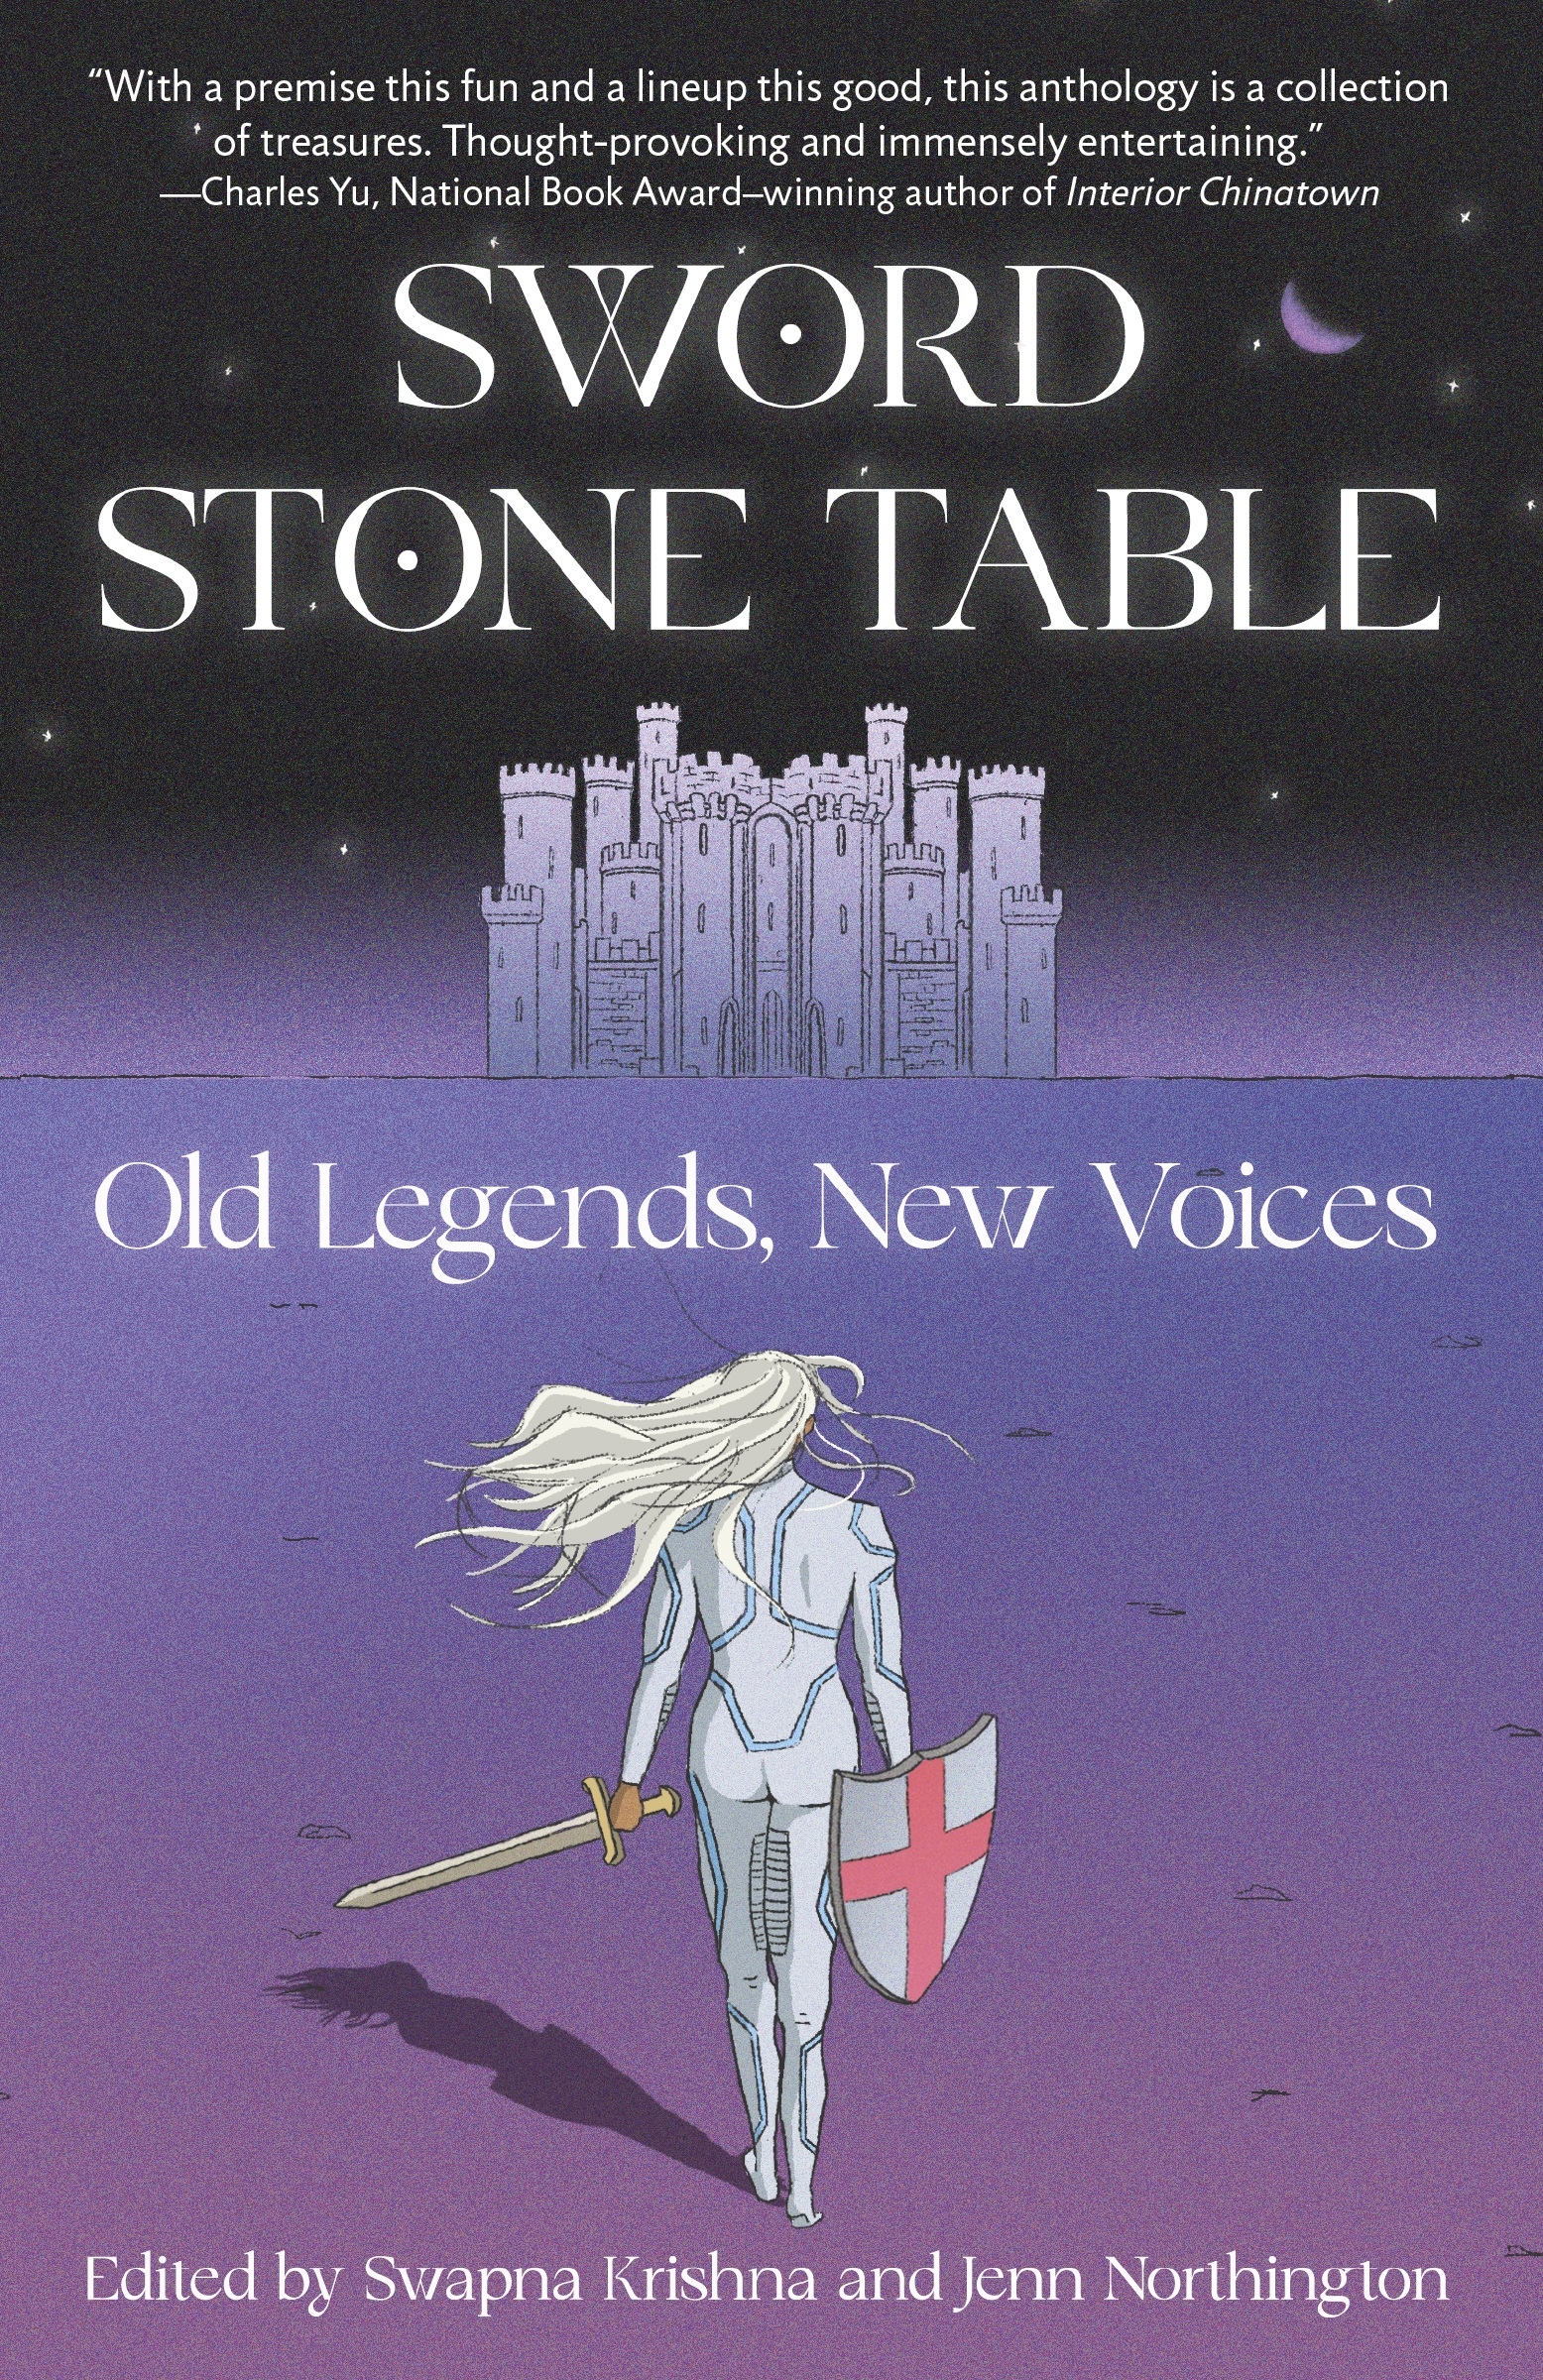 Sword Stone Table: Old Legends, New Voices by Jenn Northington, Swapna Krishna